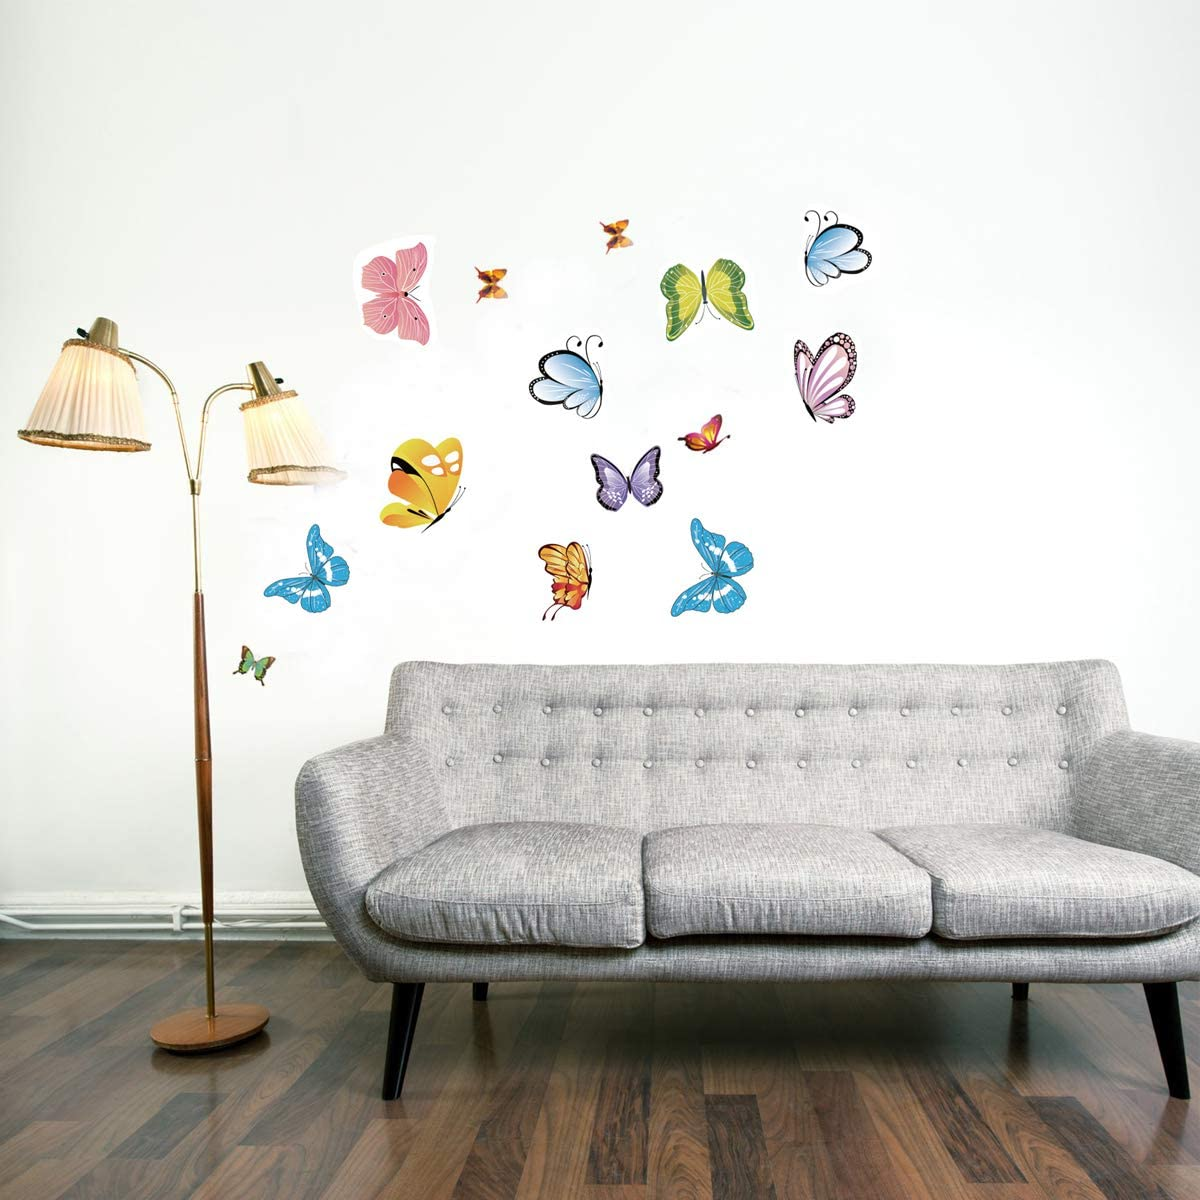 Liwein Mariposa Pegatinas de Pared,80 Piezas Adhesivos Mariposas 3D Decorativos PVC Impermeable Bricolaje Mural de Arte Artesania para Sal/ón Guarder/ía Habitaci/ón Infantiles Ni/ños Beb/és Dormitorio